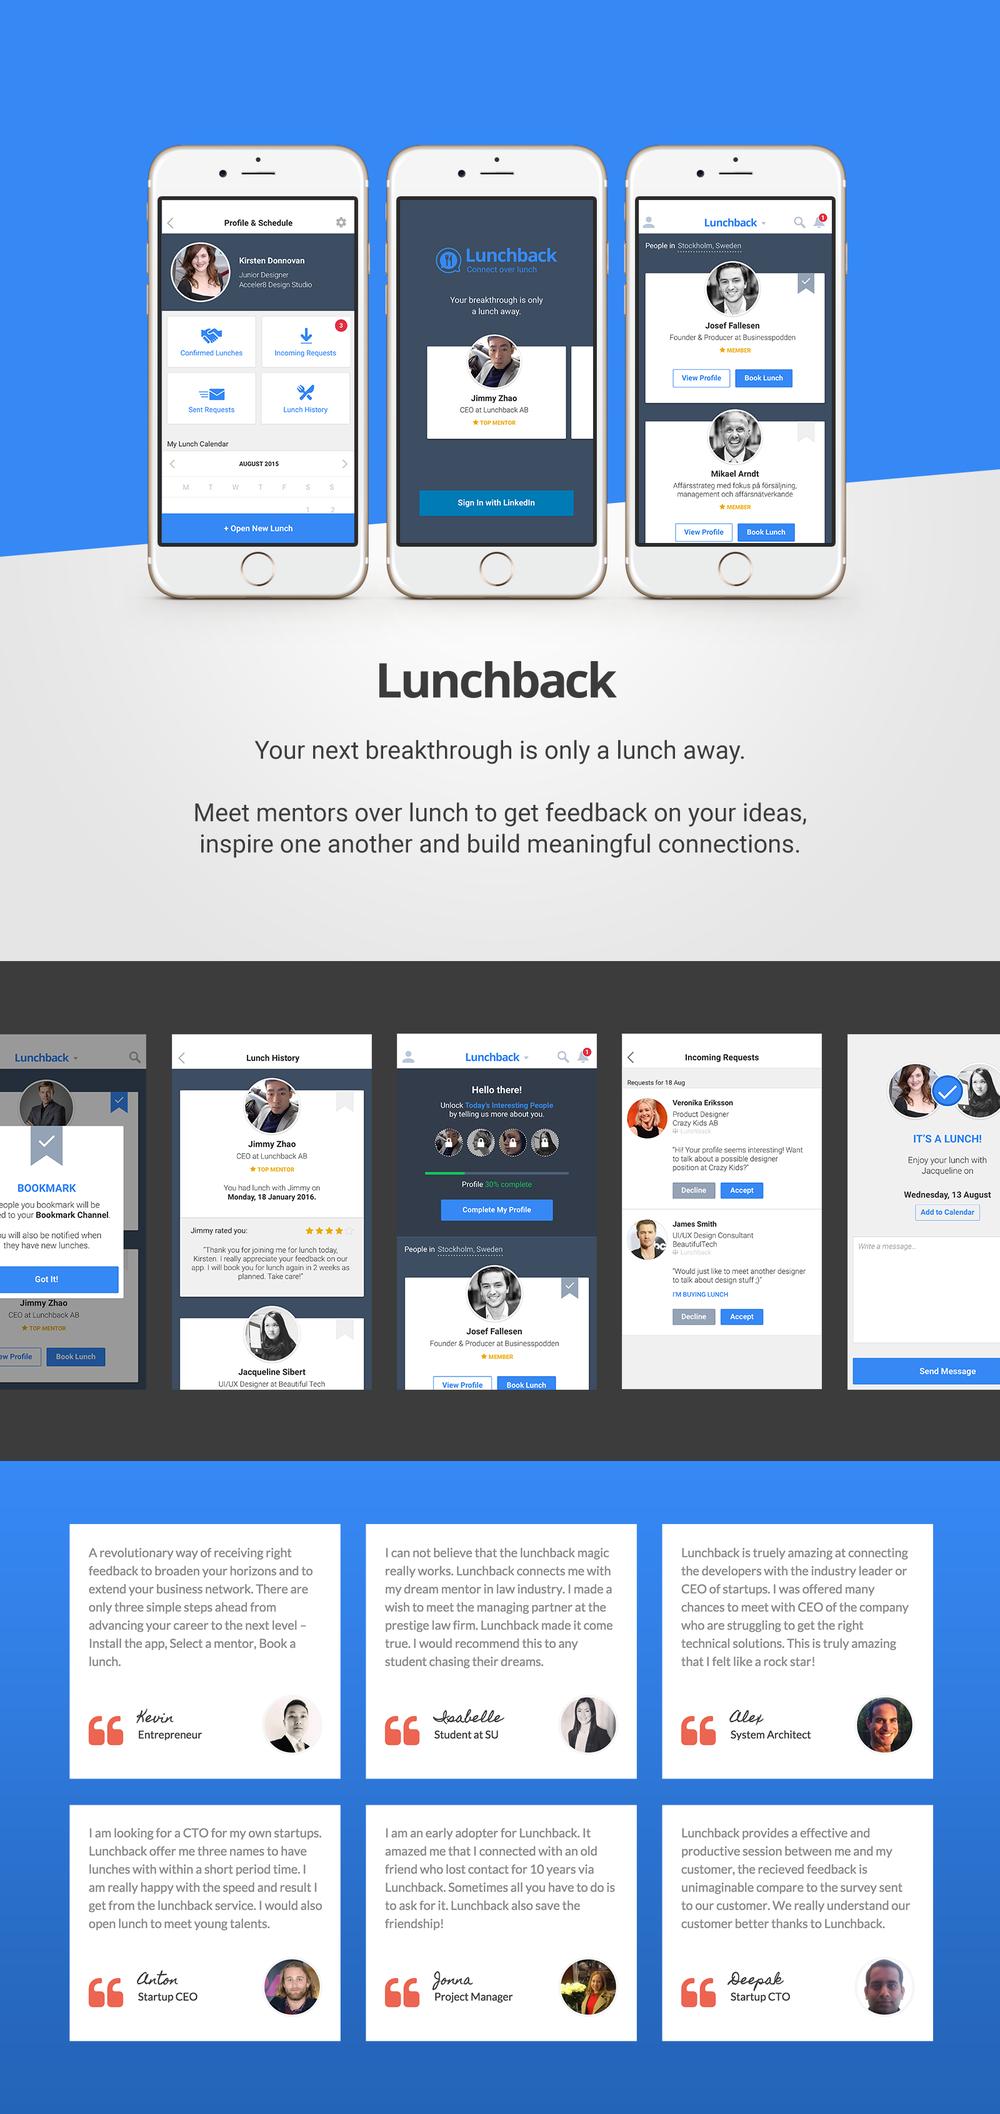 lunchback_presentation